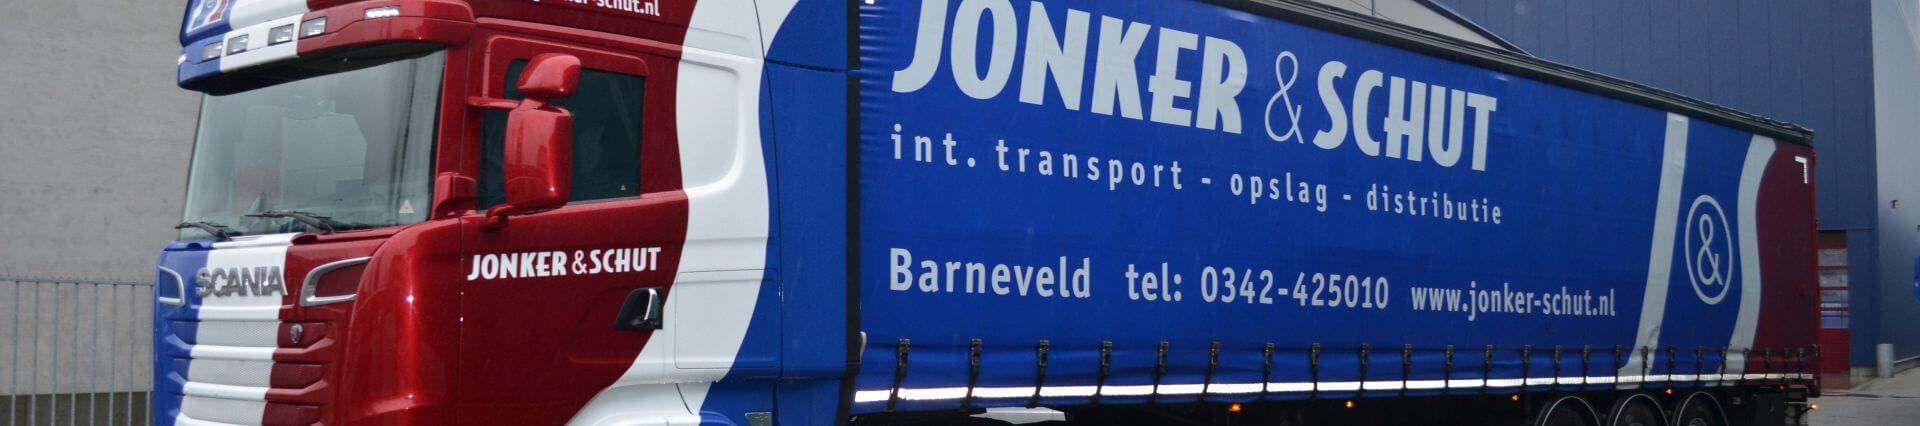 Jonker & Schut